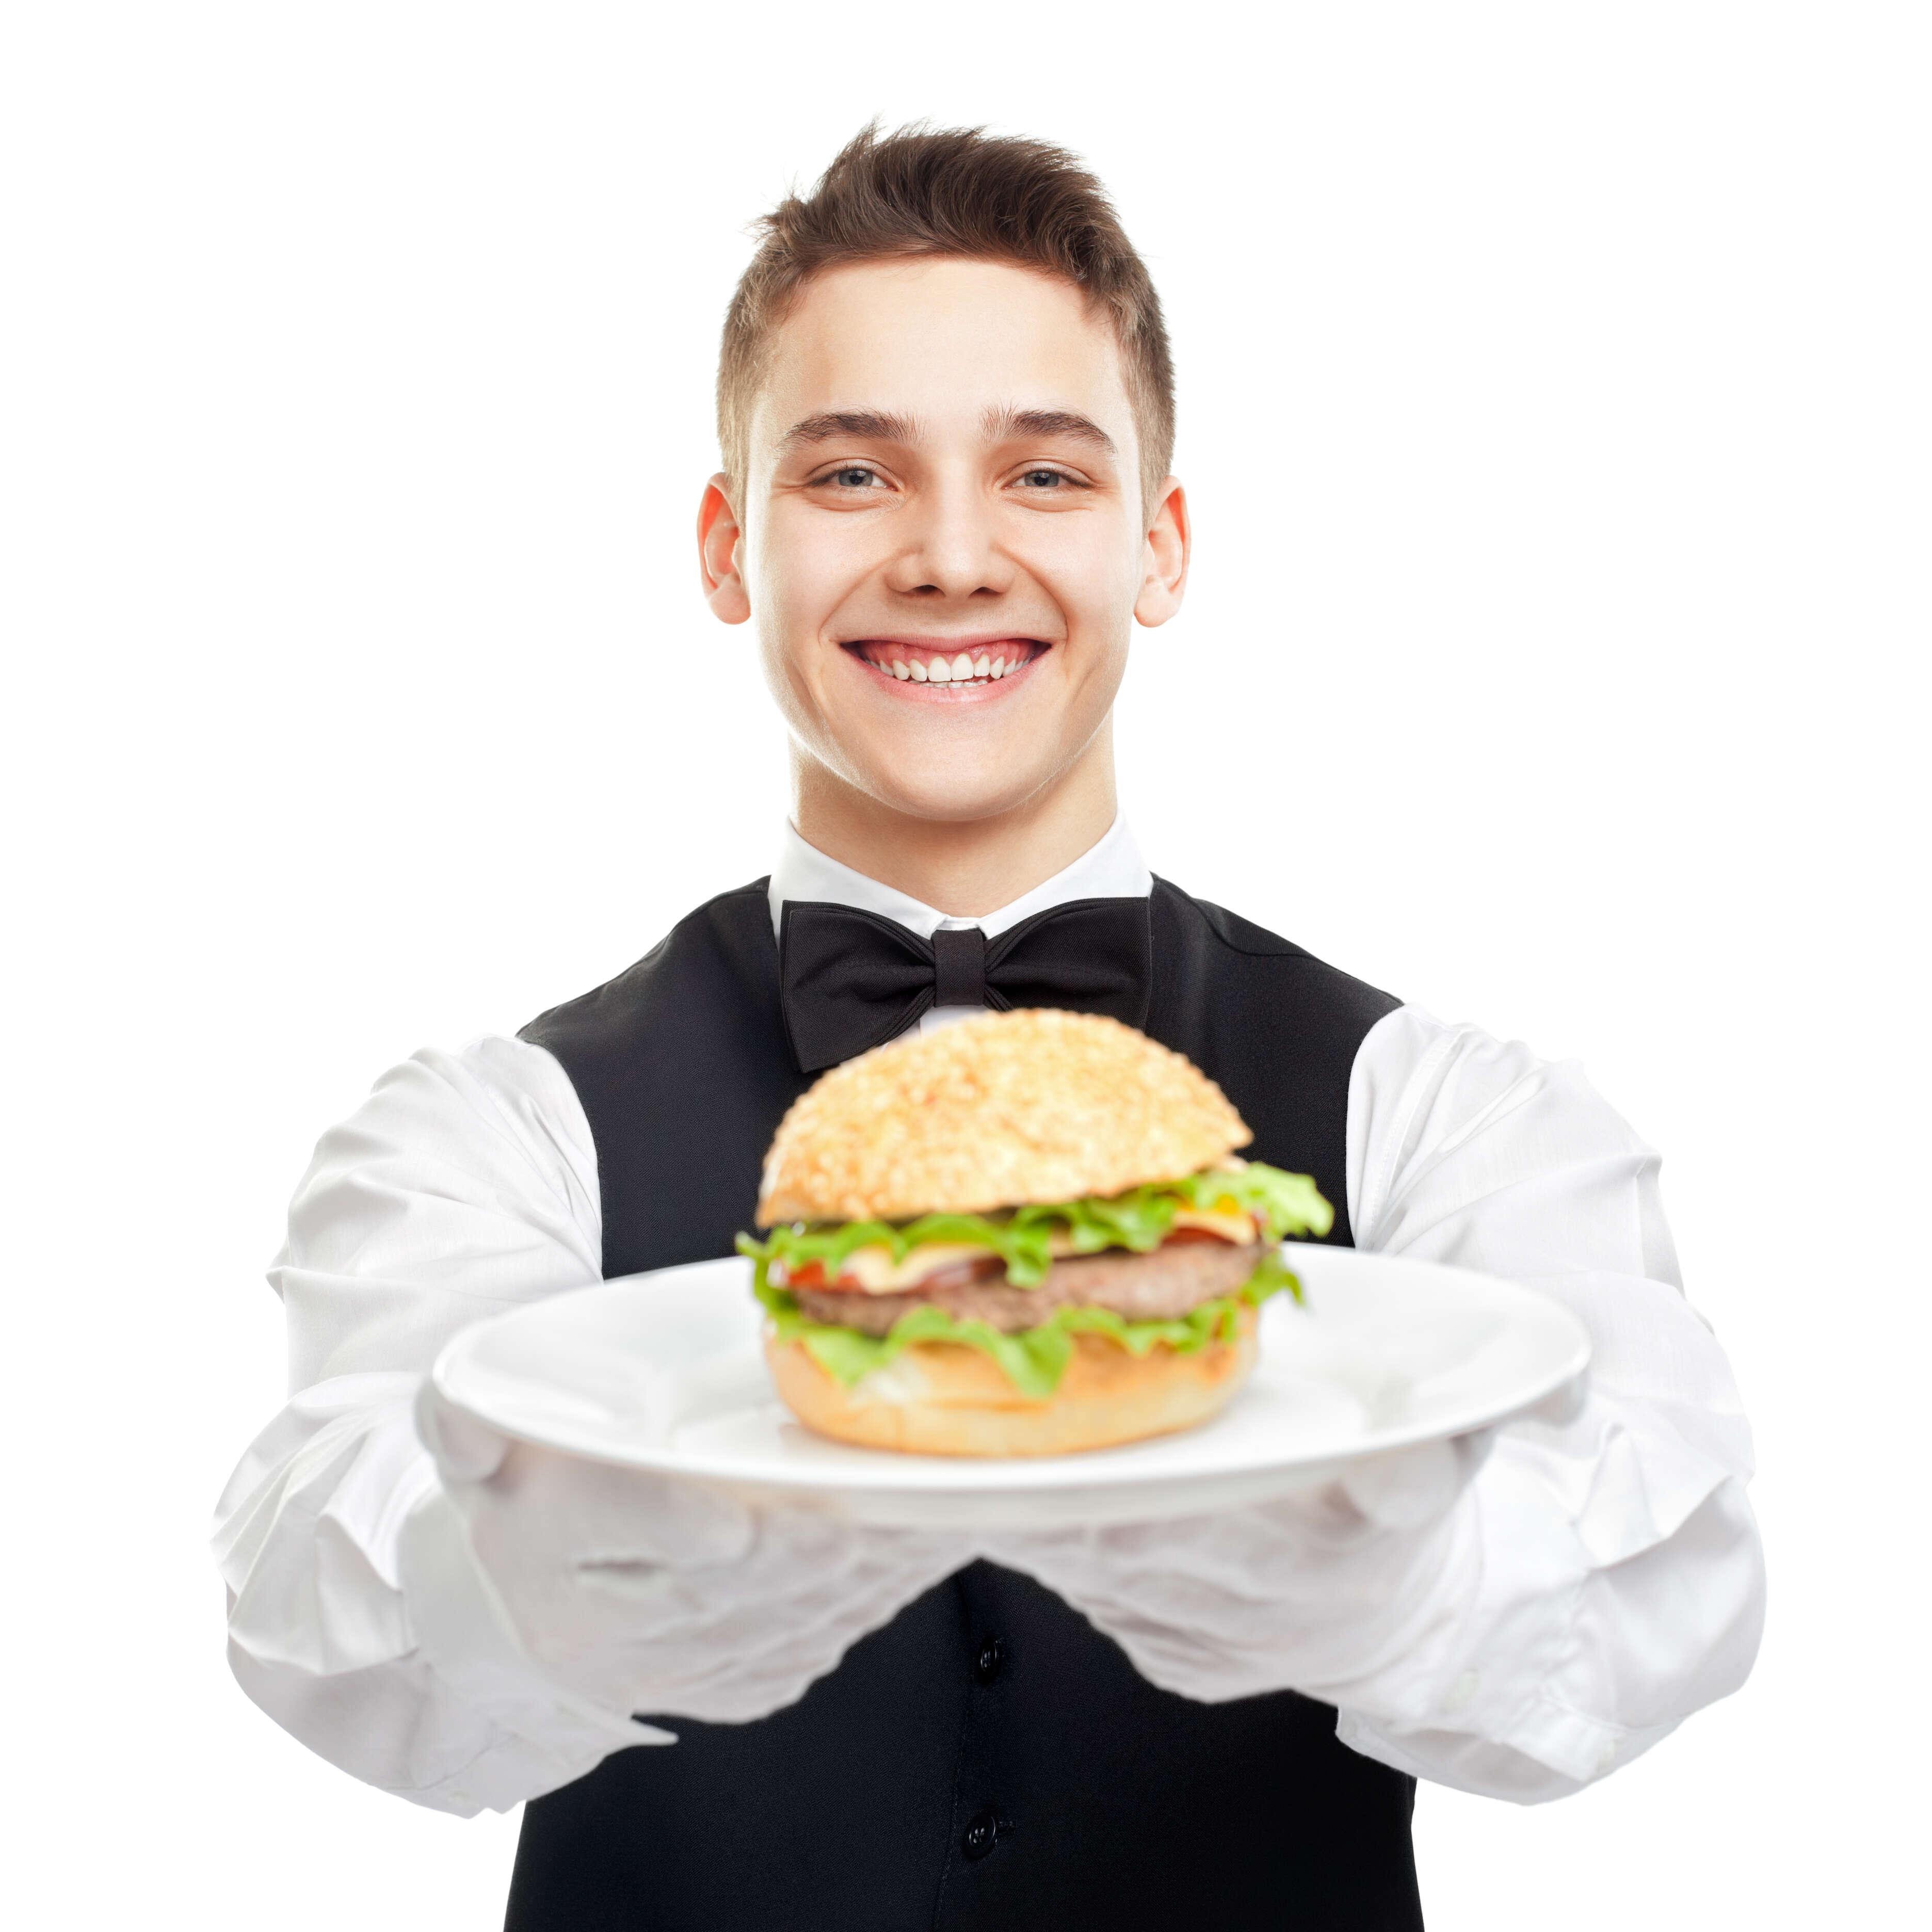 Best Burger joints in El Paso